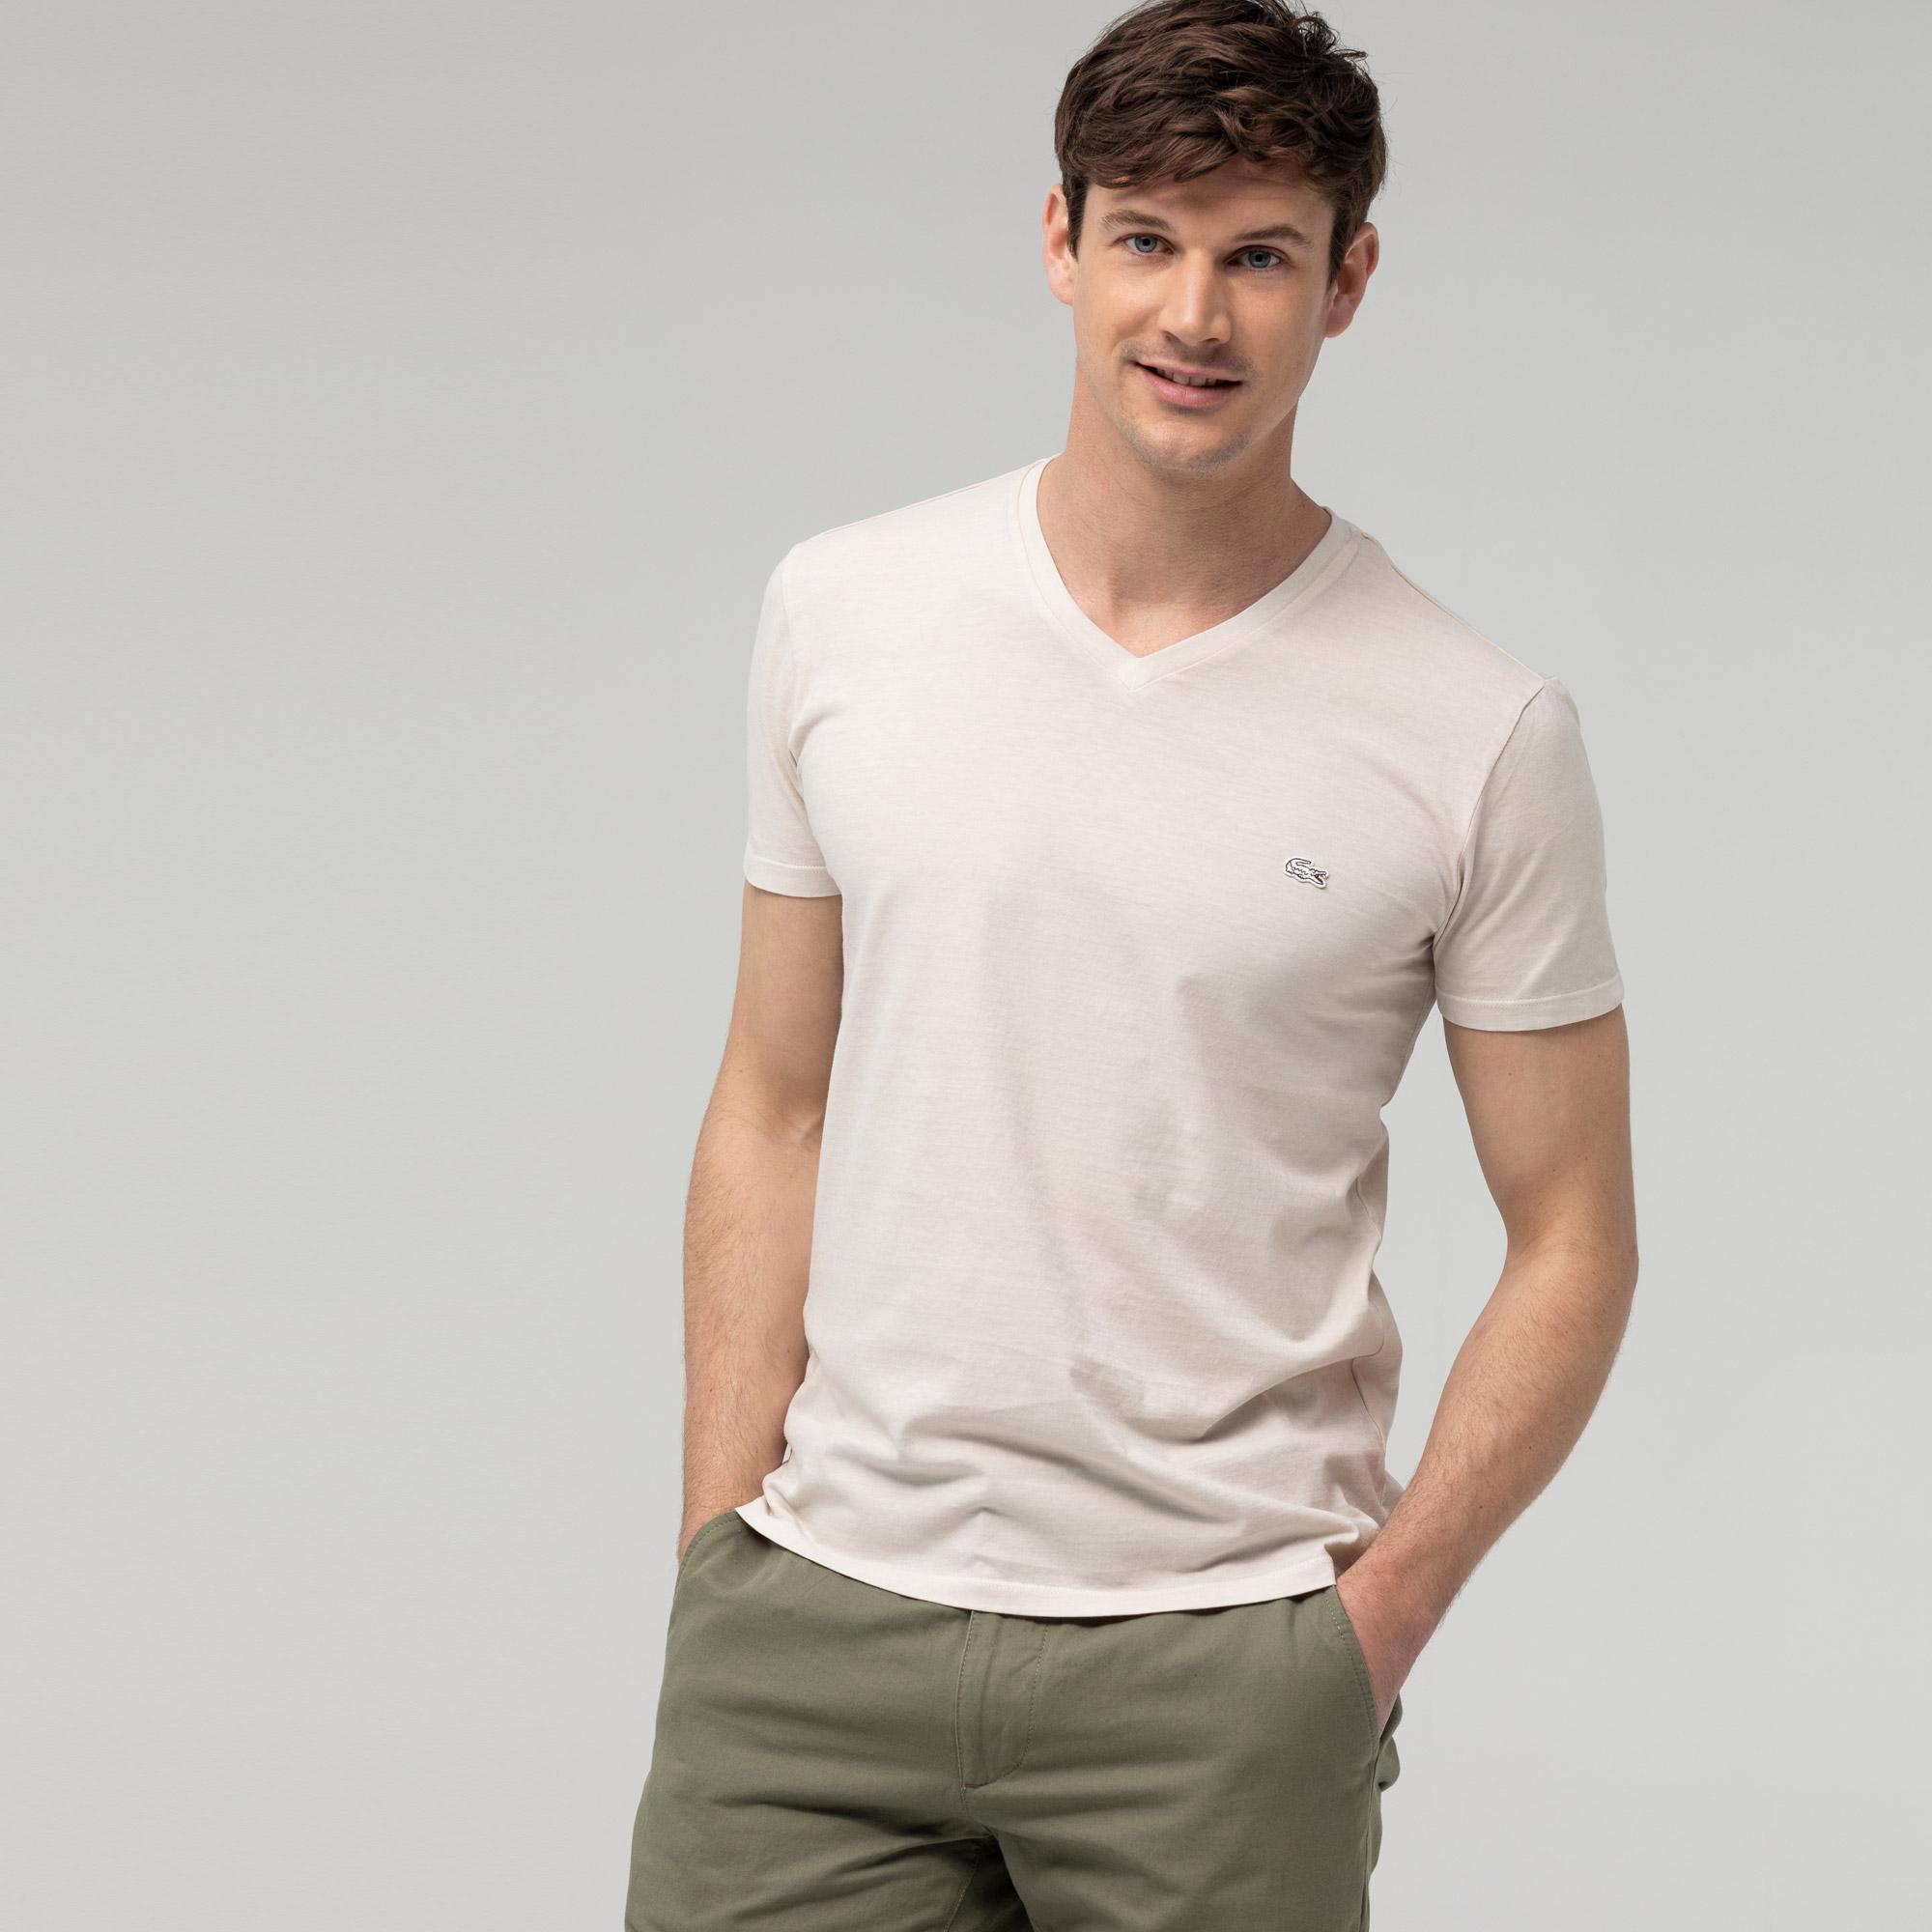 Lacoste Erkek Slim Fit V Yaka Bej T-Shirt